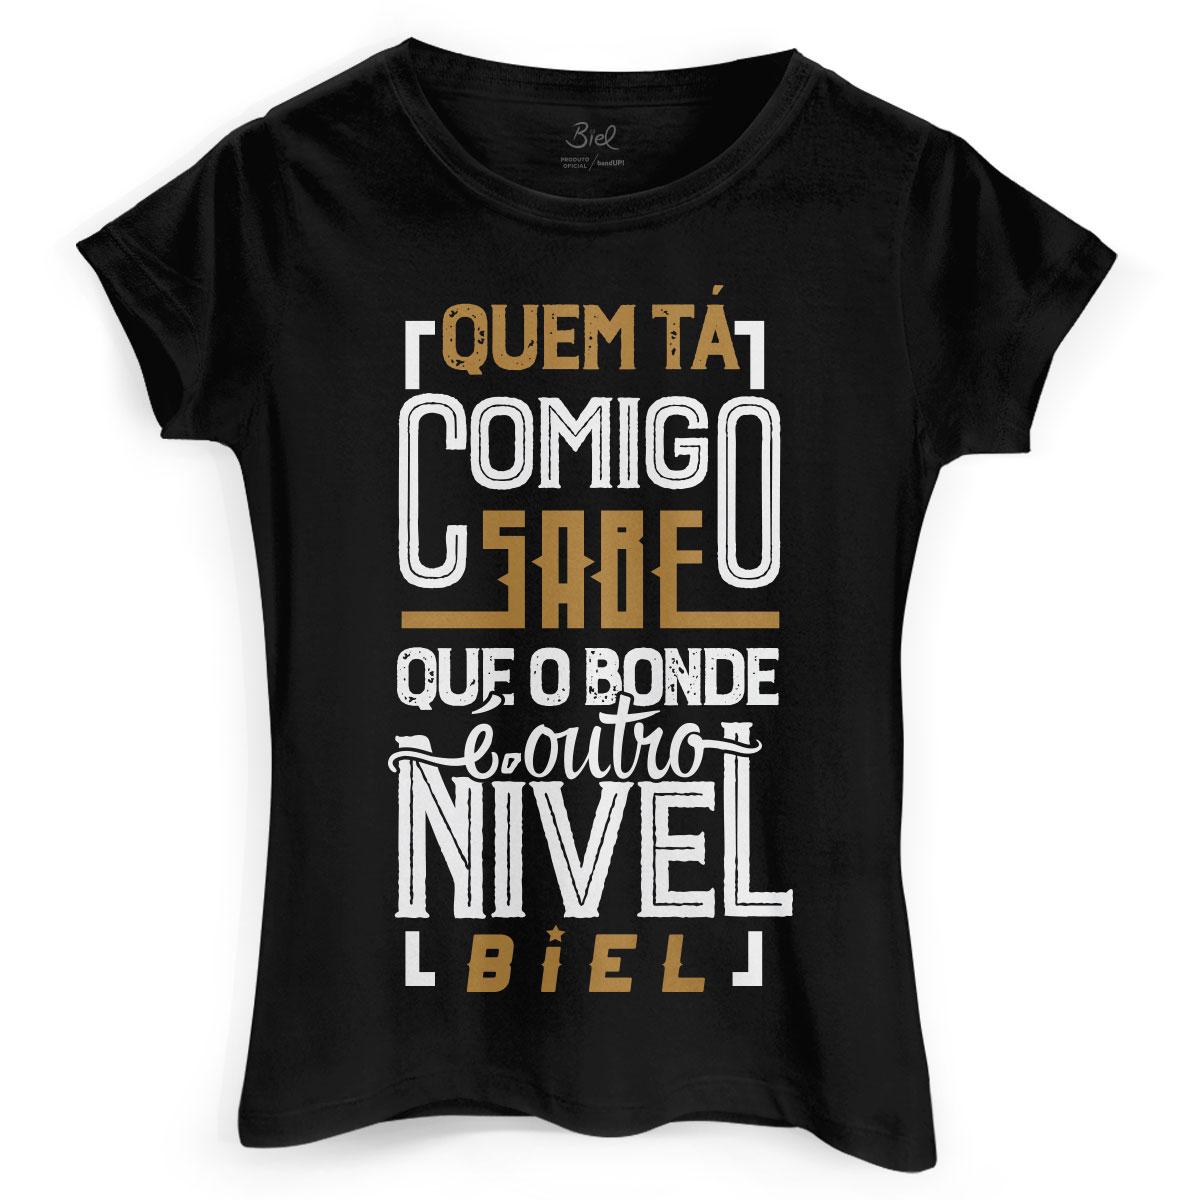 Camiseta Feminina Biel Tô Tirando Onda